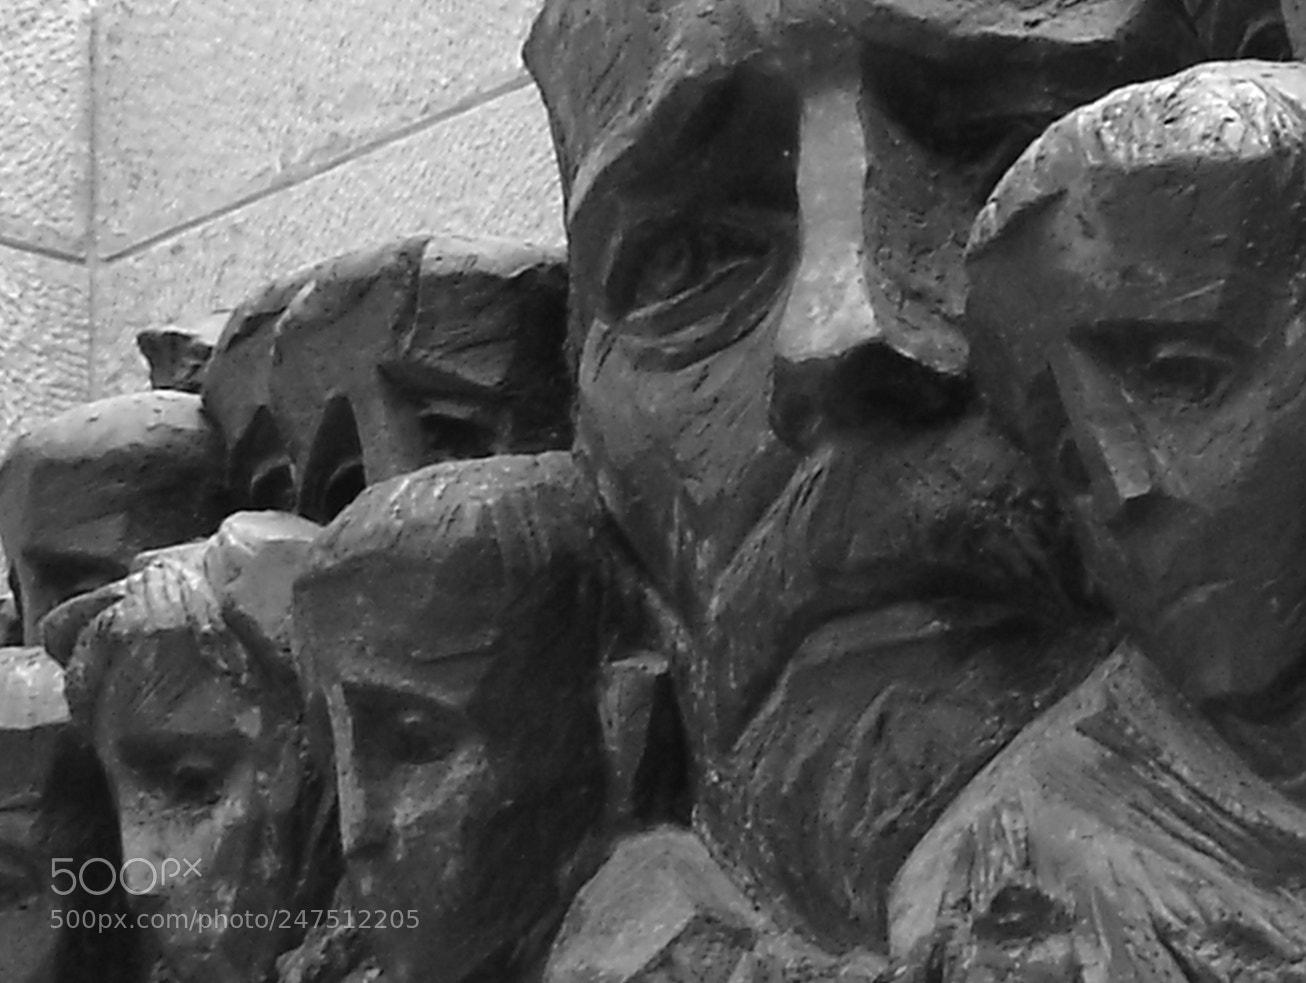 Tribute to Janusz Korczak